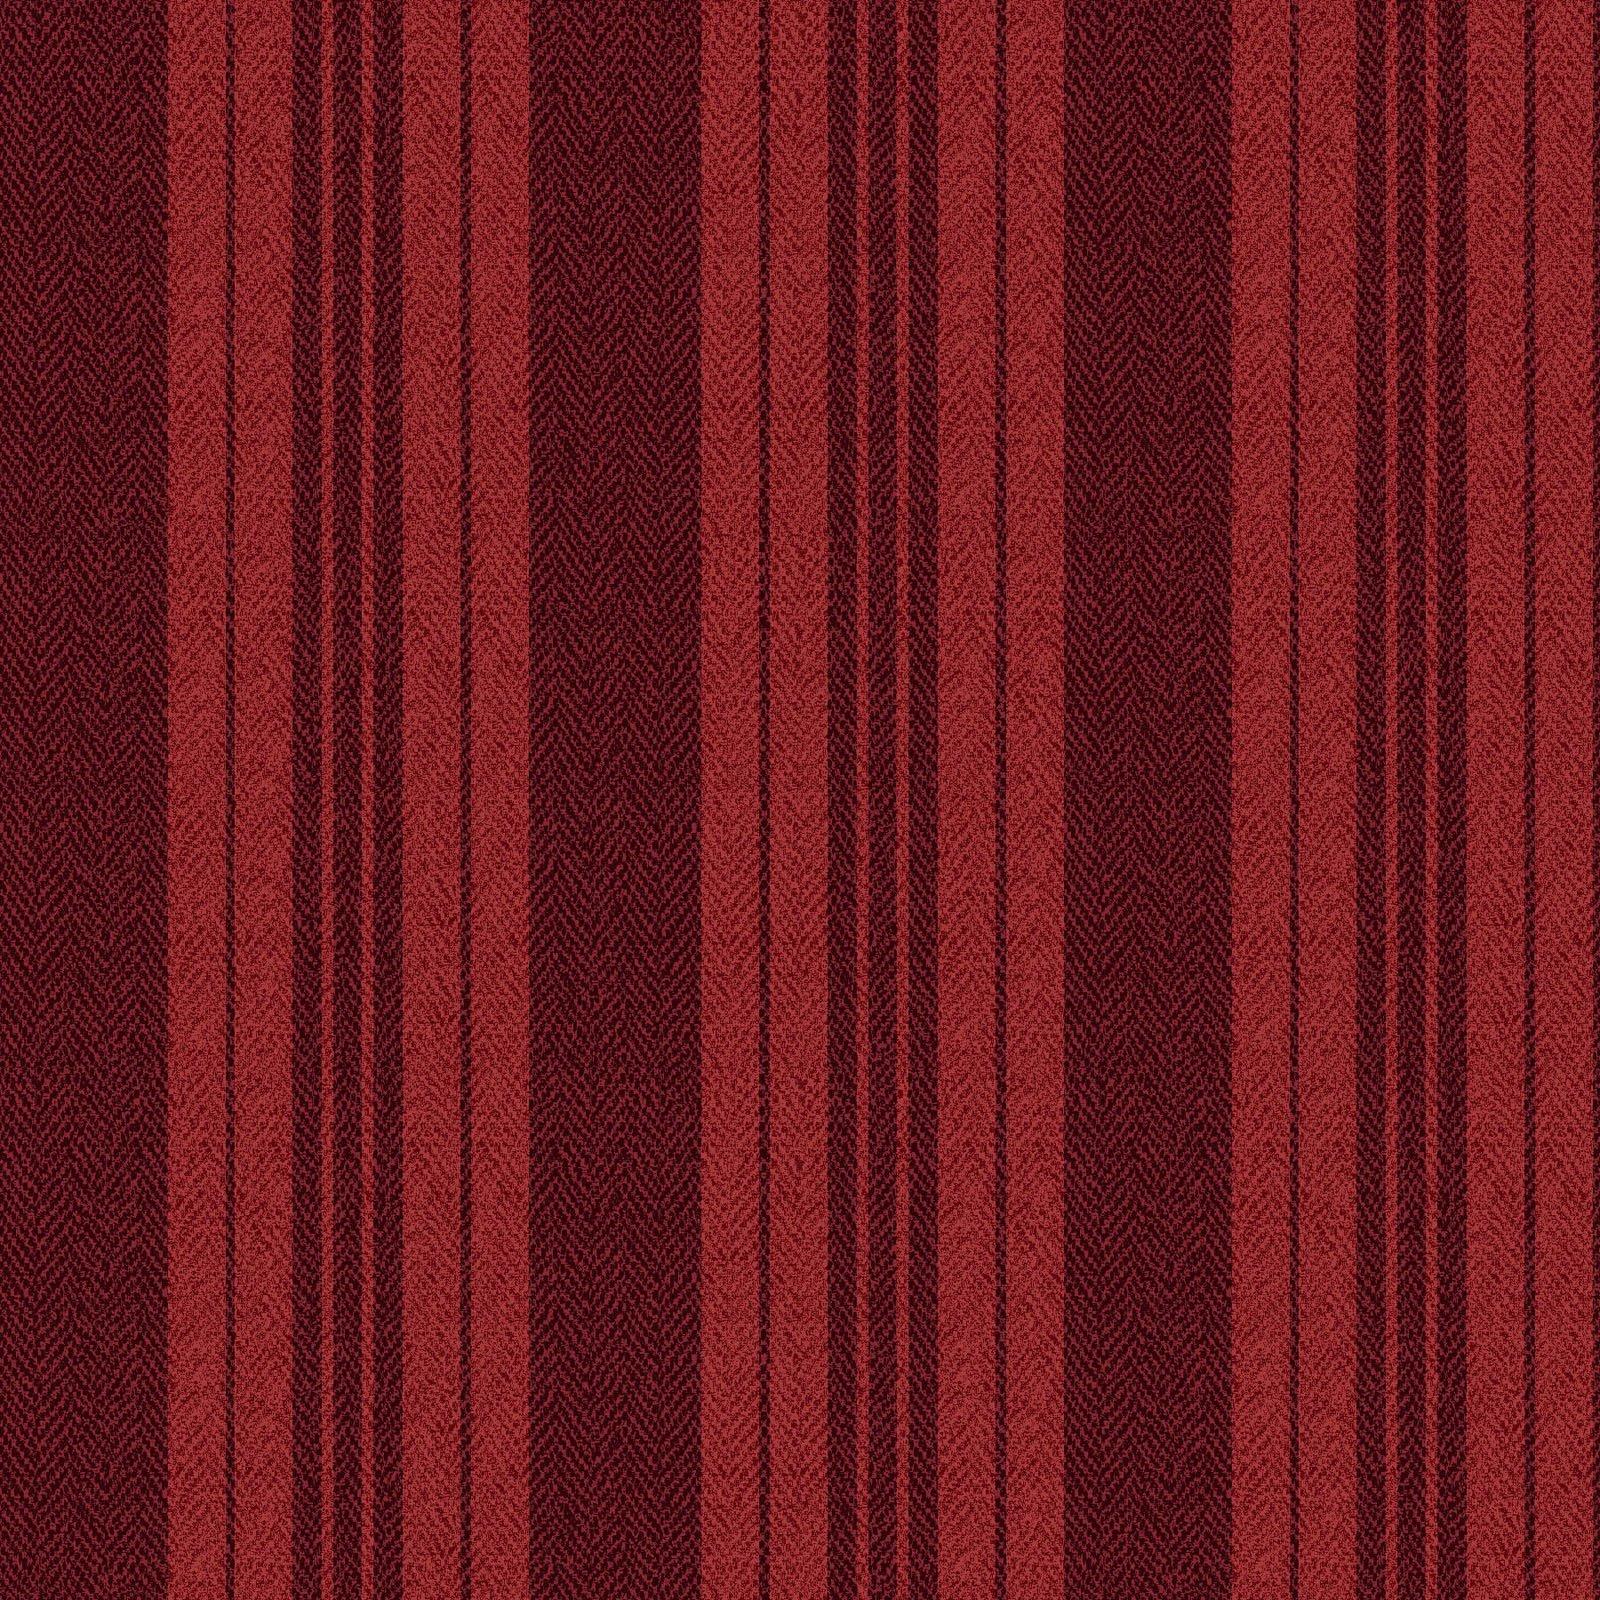 Ruby - Ticking Stripe - Red